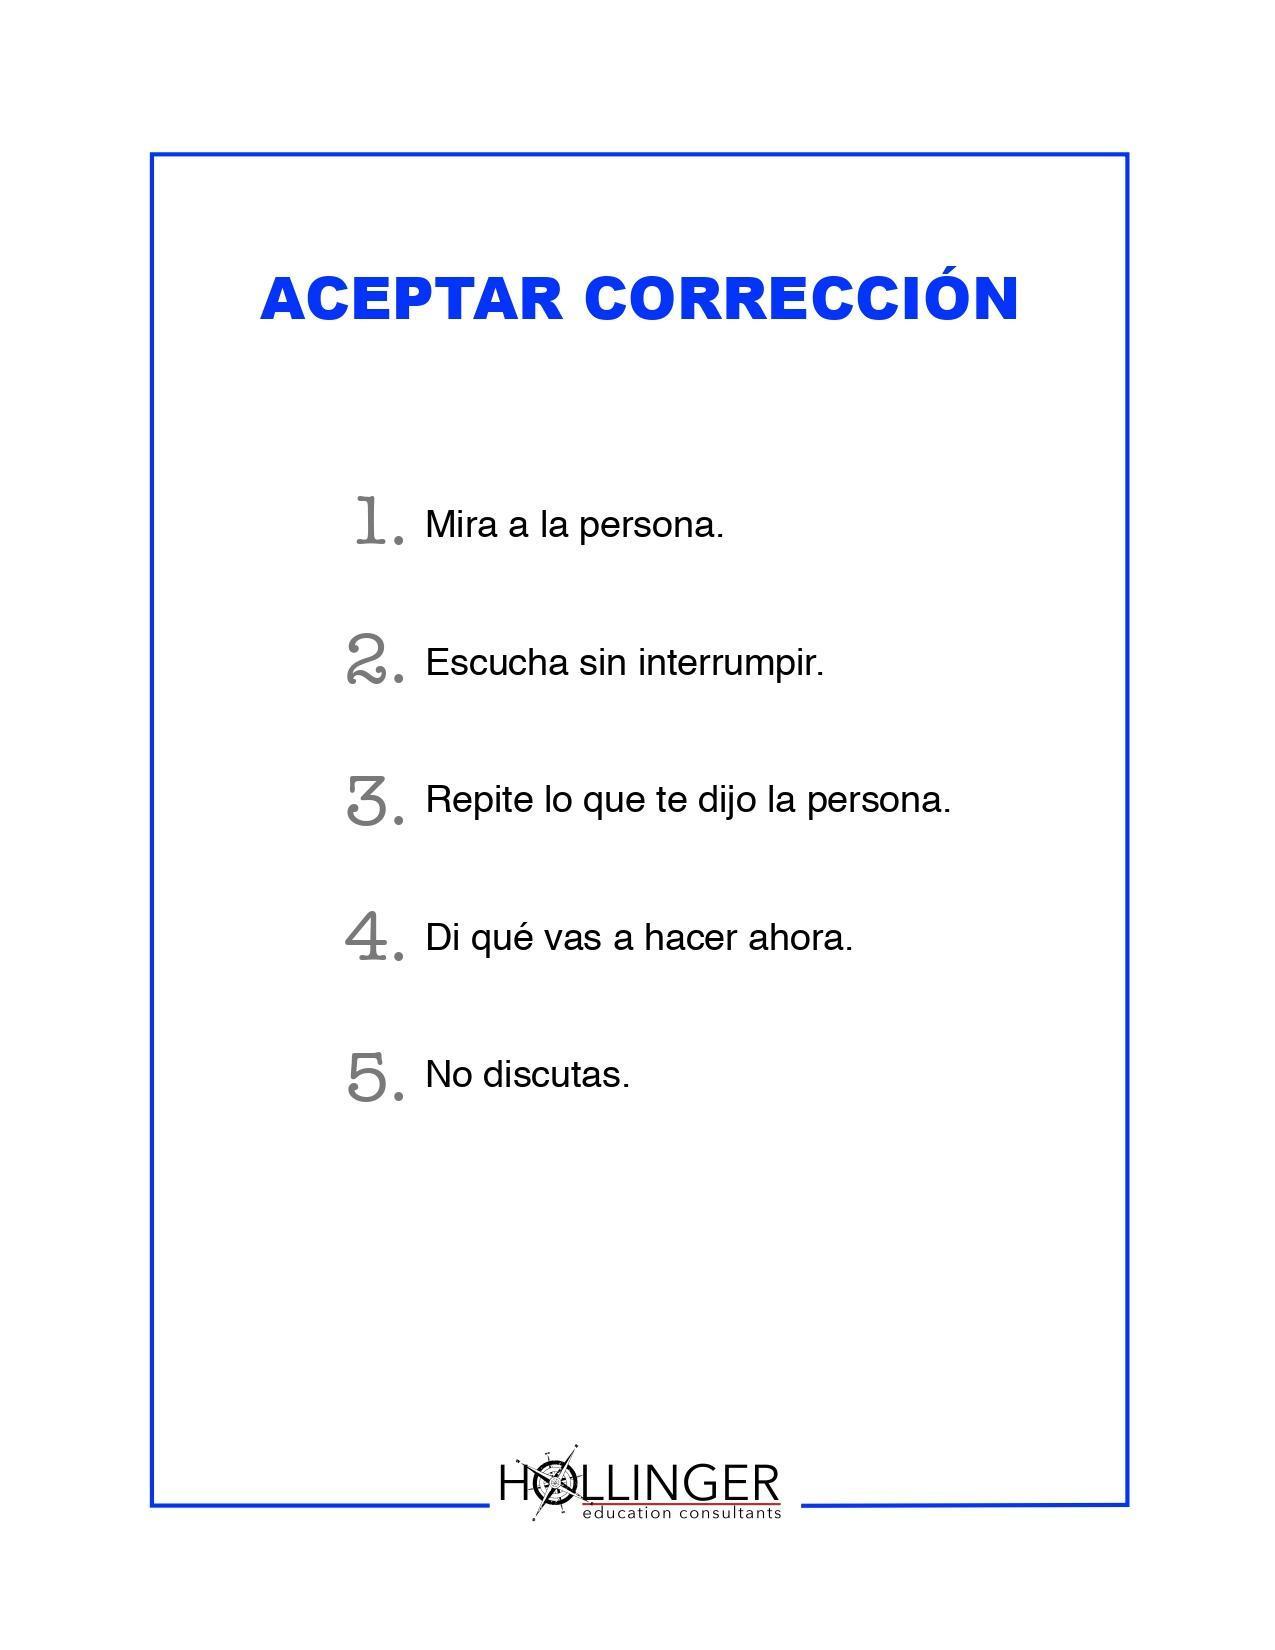 Project RESSPECT: Aceptar Corrección